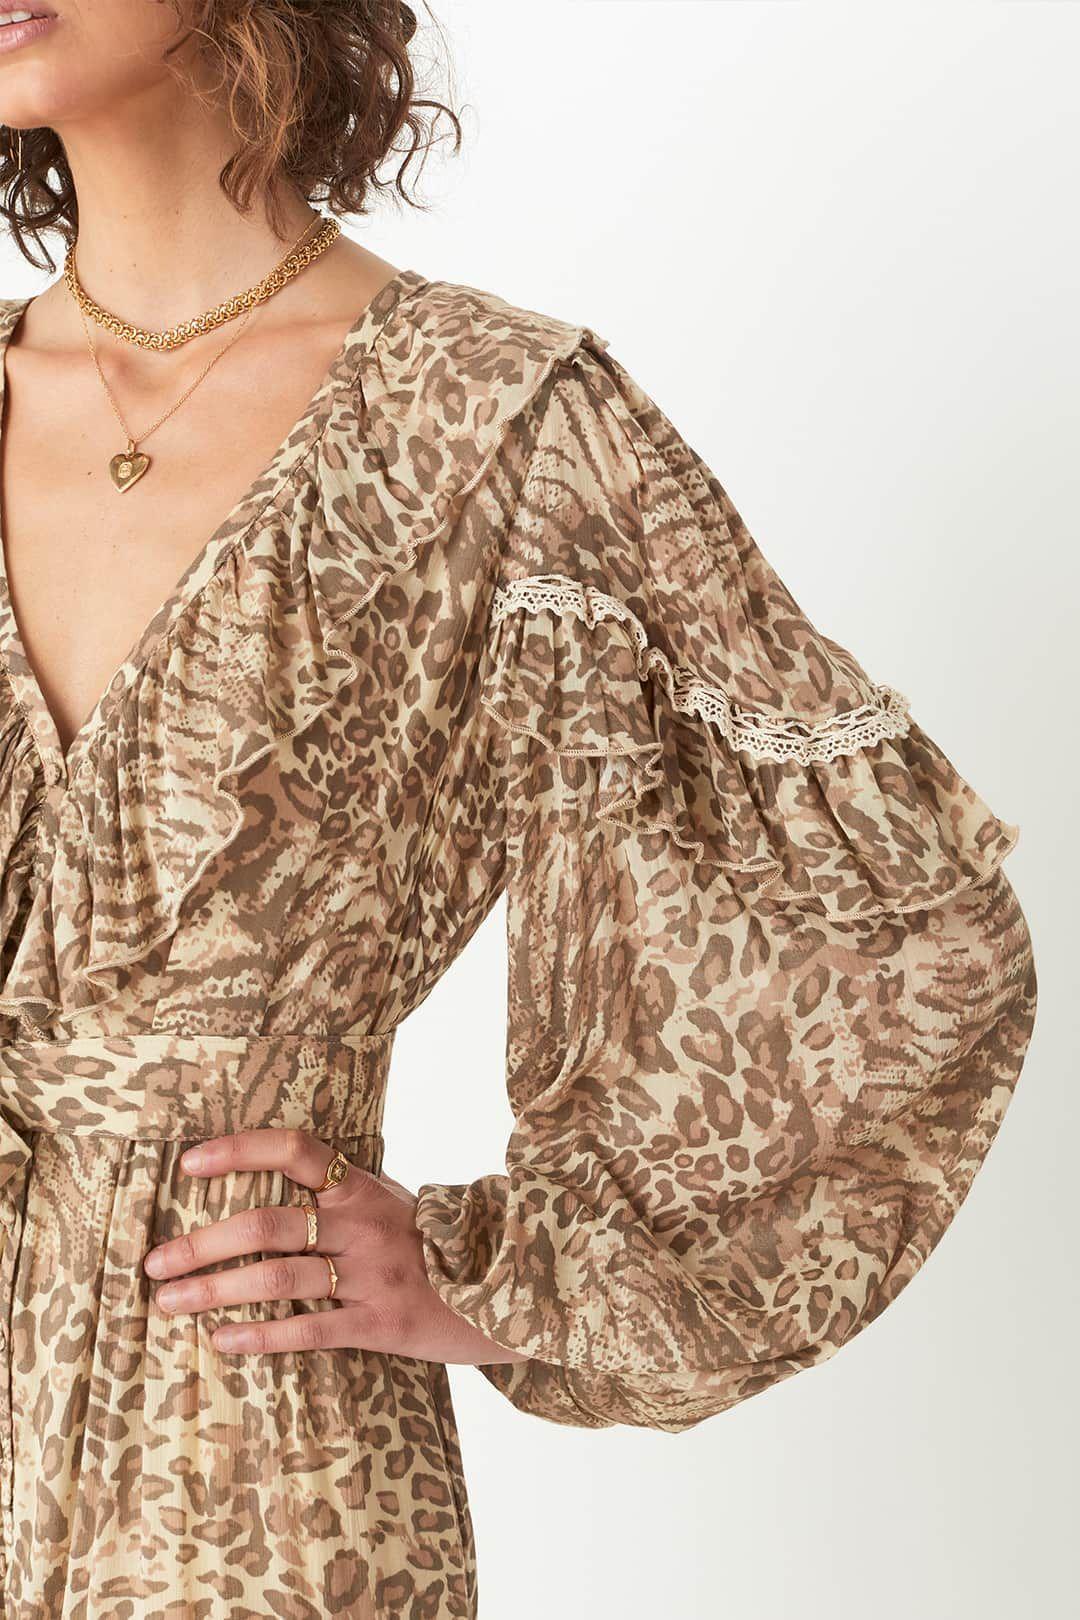 Spell Ada Gown Leopard Maxi Dress V-Neckline